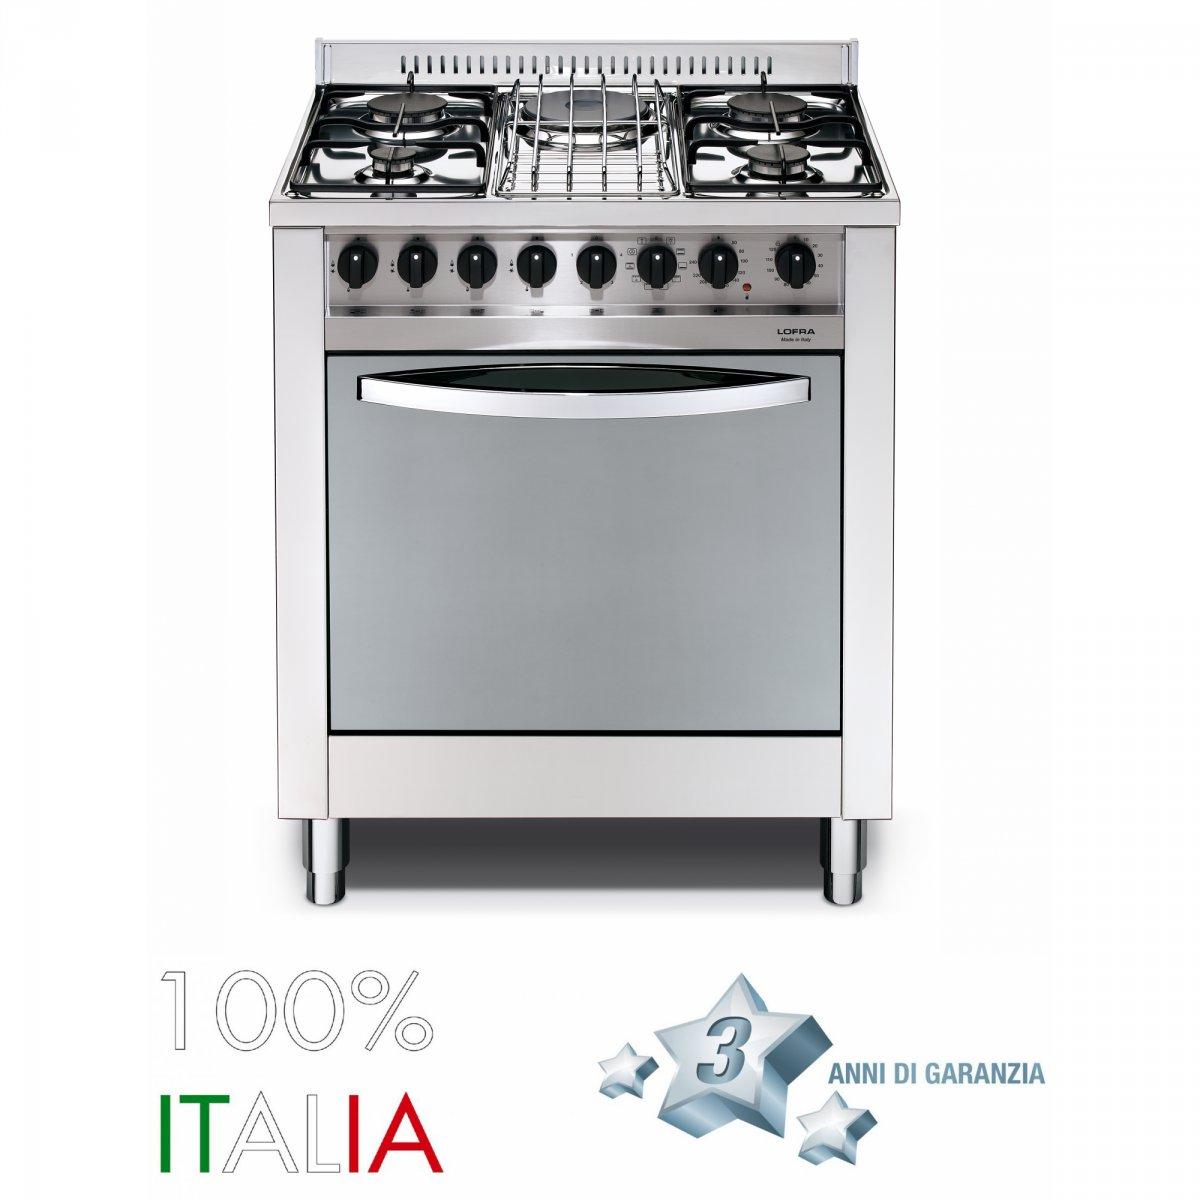 Lofra cucina neomaxima 70 forno gas 75 lofra - Elettrodomestici cucina a gas ...